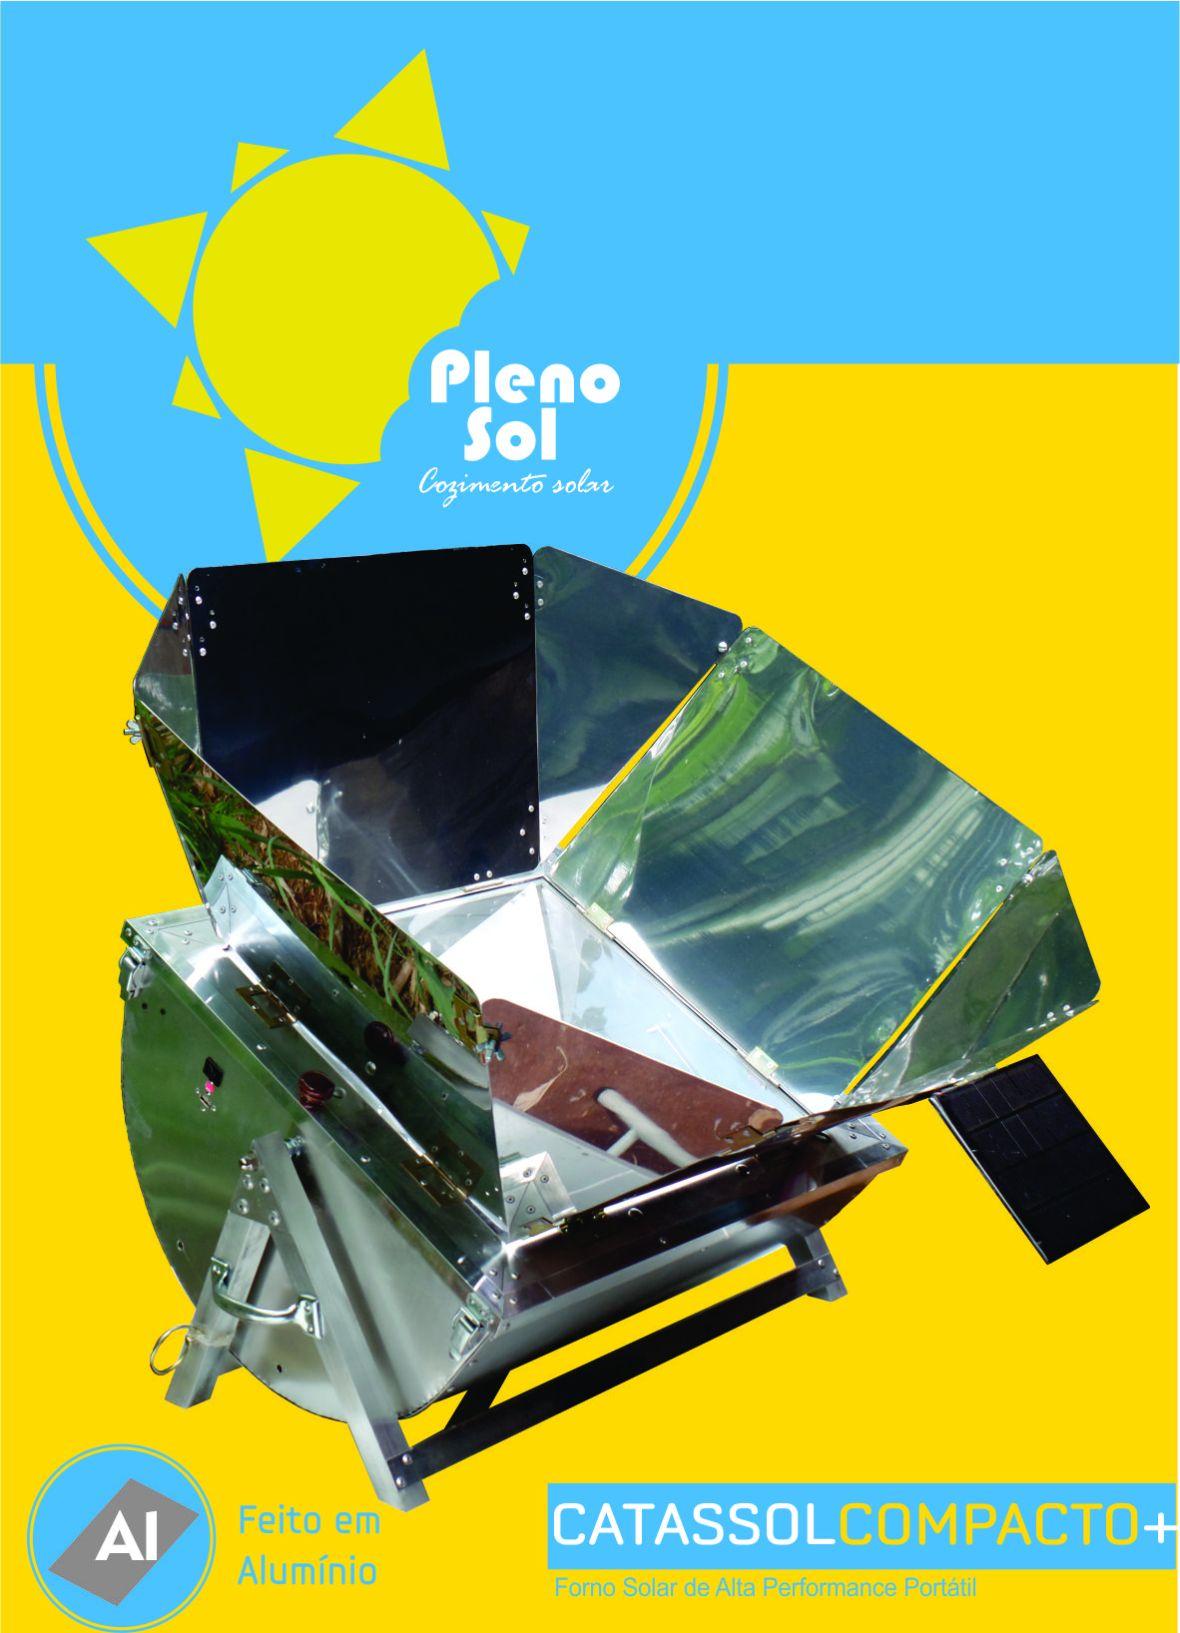 banner-pleno-sol-catassolcompacto_blog